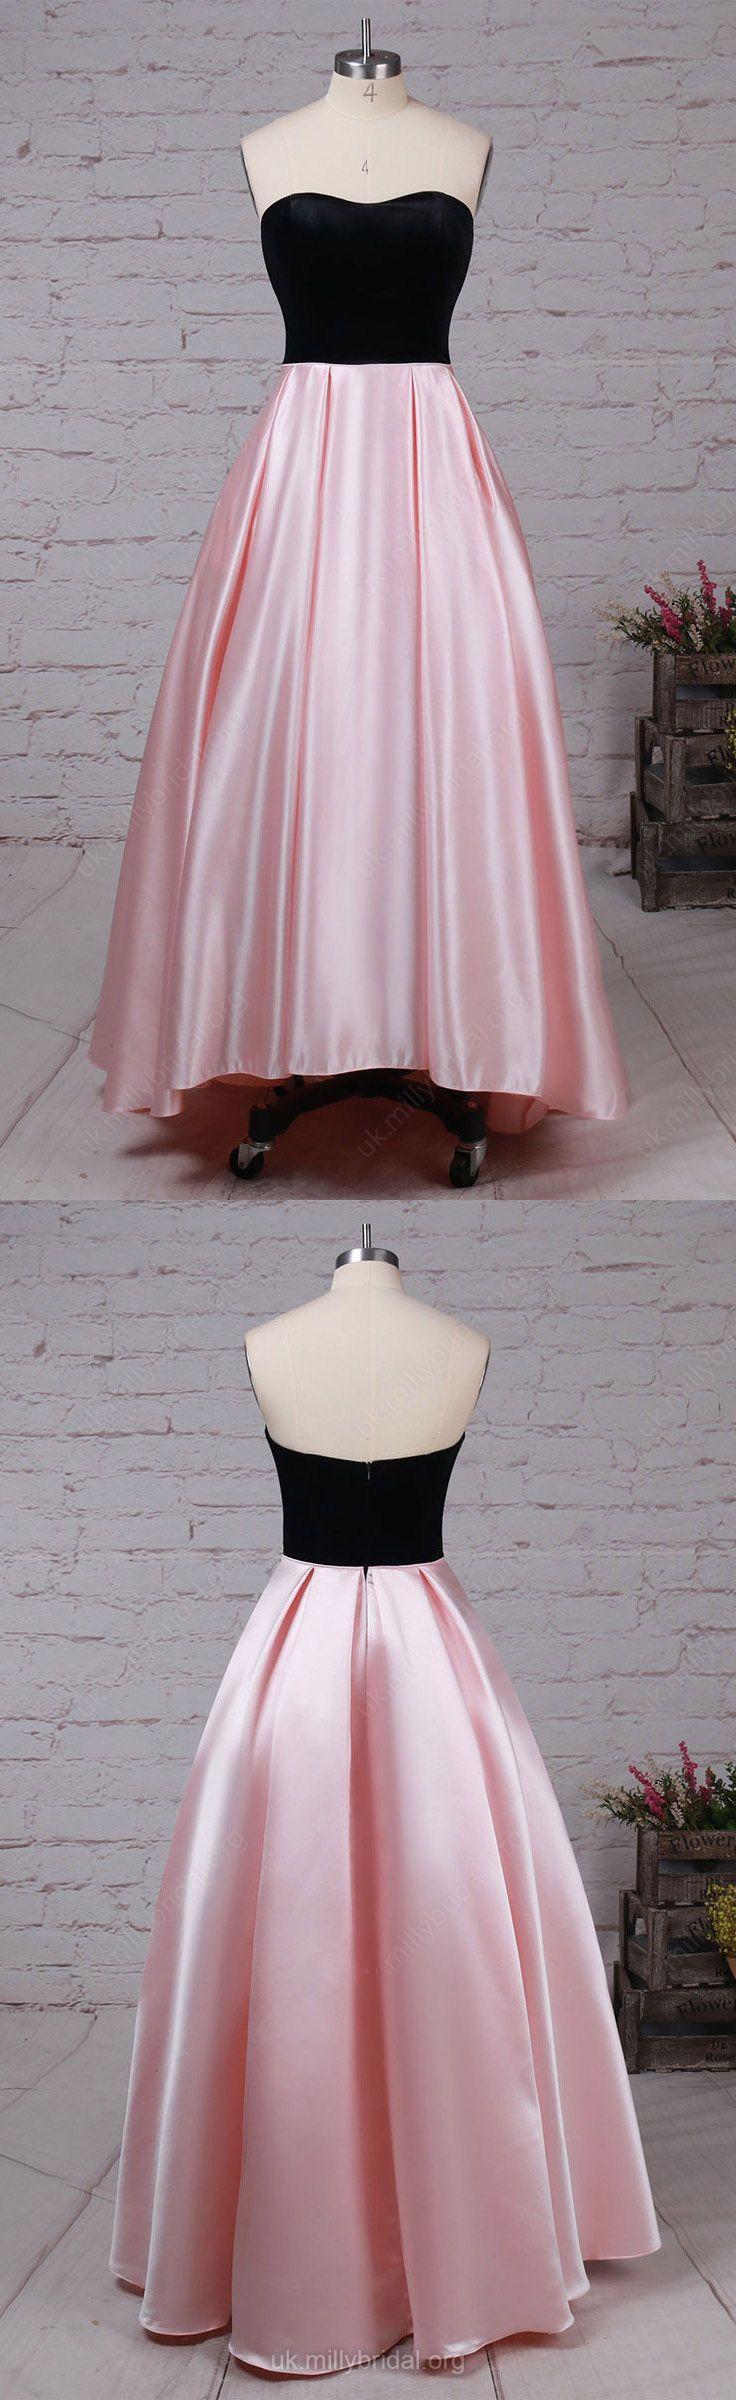 High Low Prom Dresses,Pink Prom Dresses,Ball Gown Prom Dresses For Teens,Satin Prom Dresses Strapless. Asymmetrical Prom Dresses Pockets #ballgowns